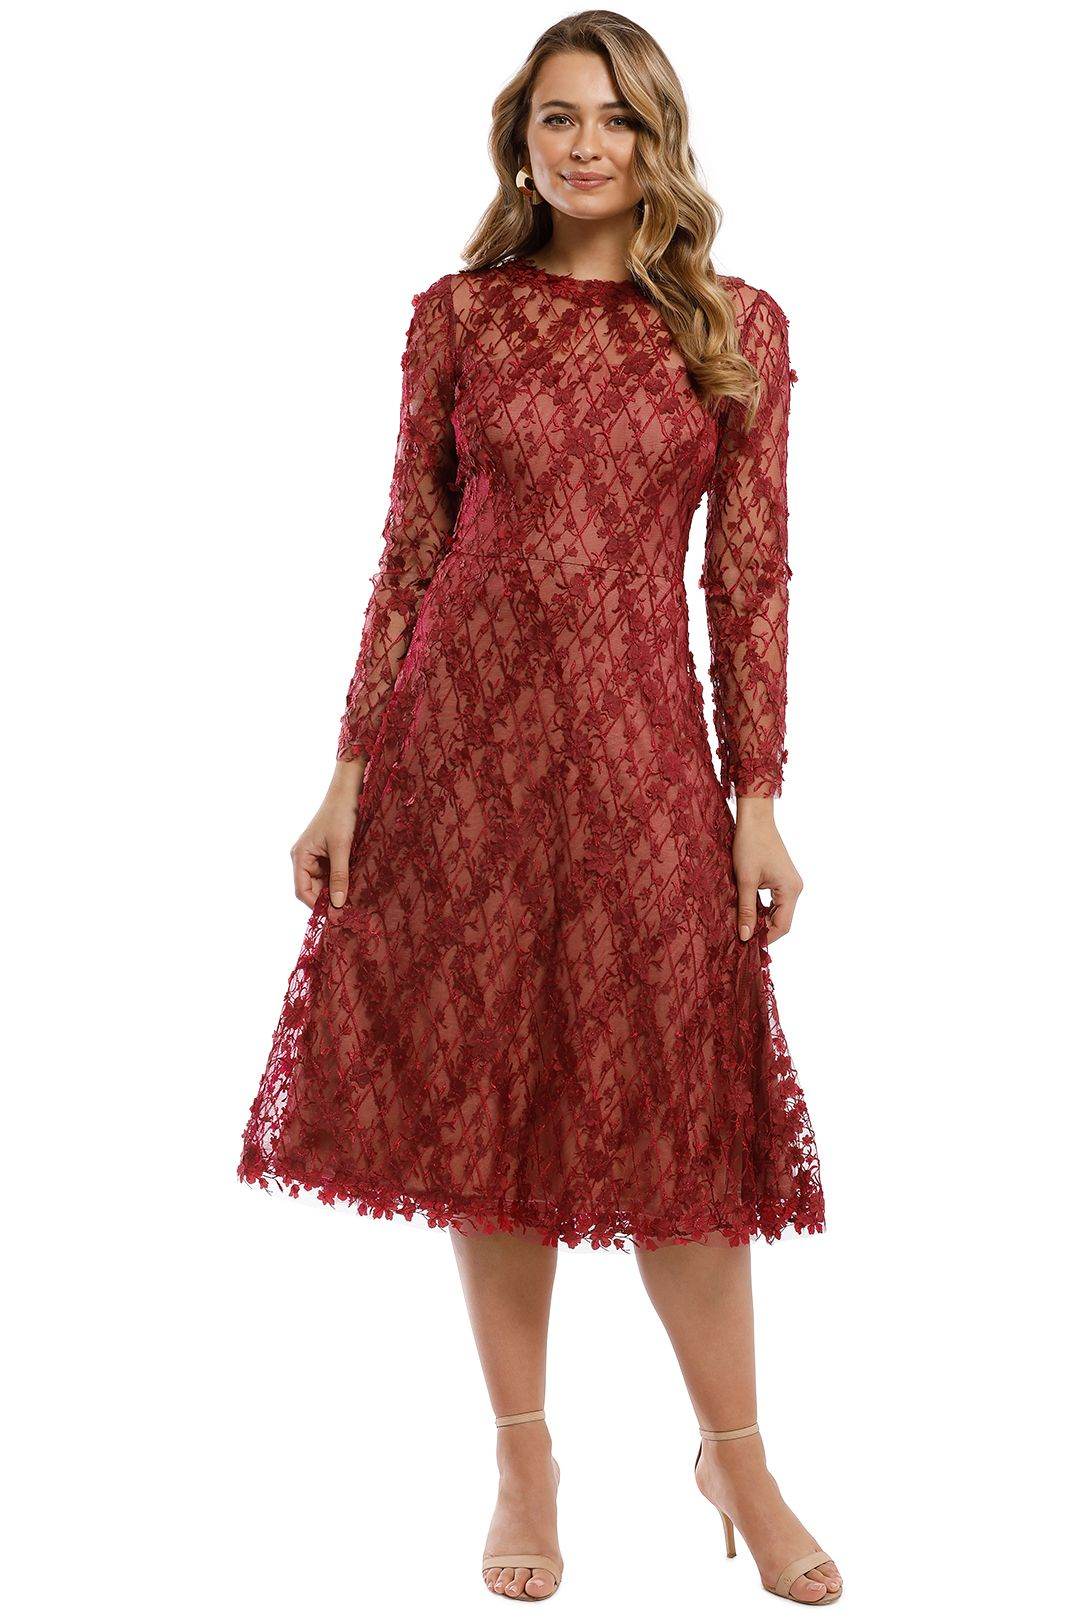 Tadashi Shoji - Binx Embroidery Tea-Length Dress - Roseberry - Front